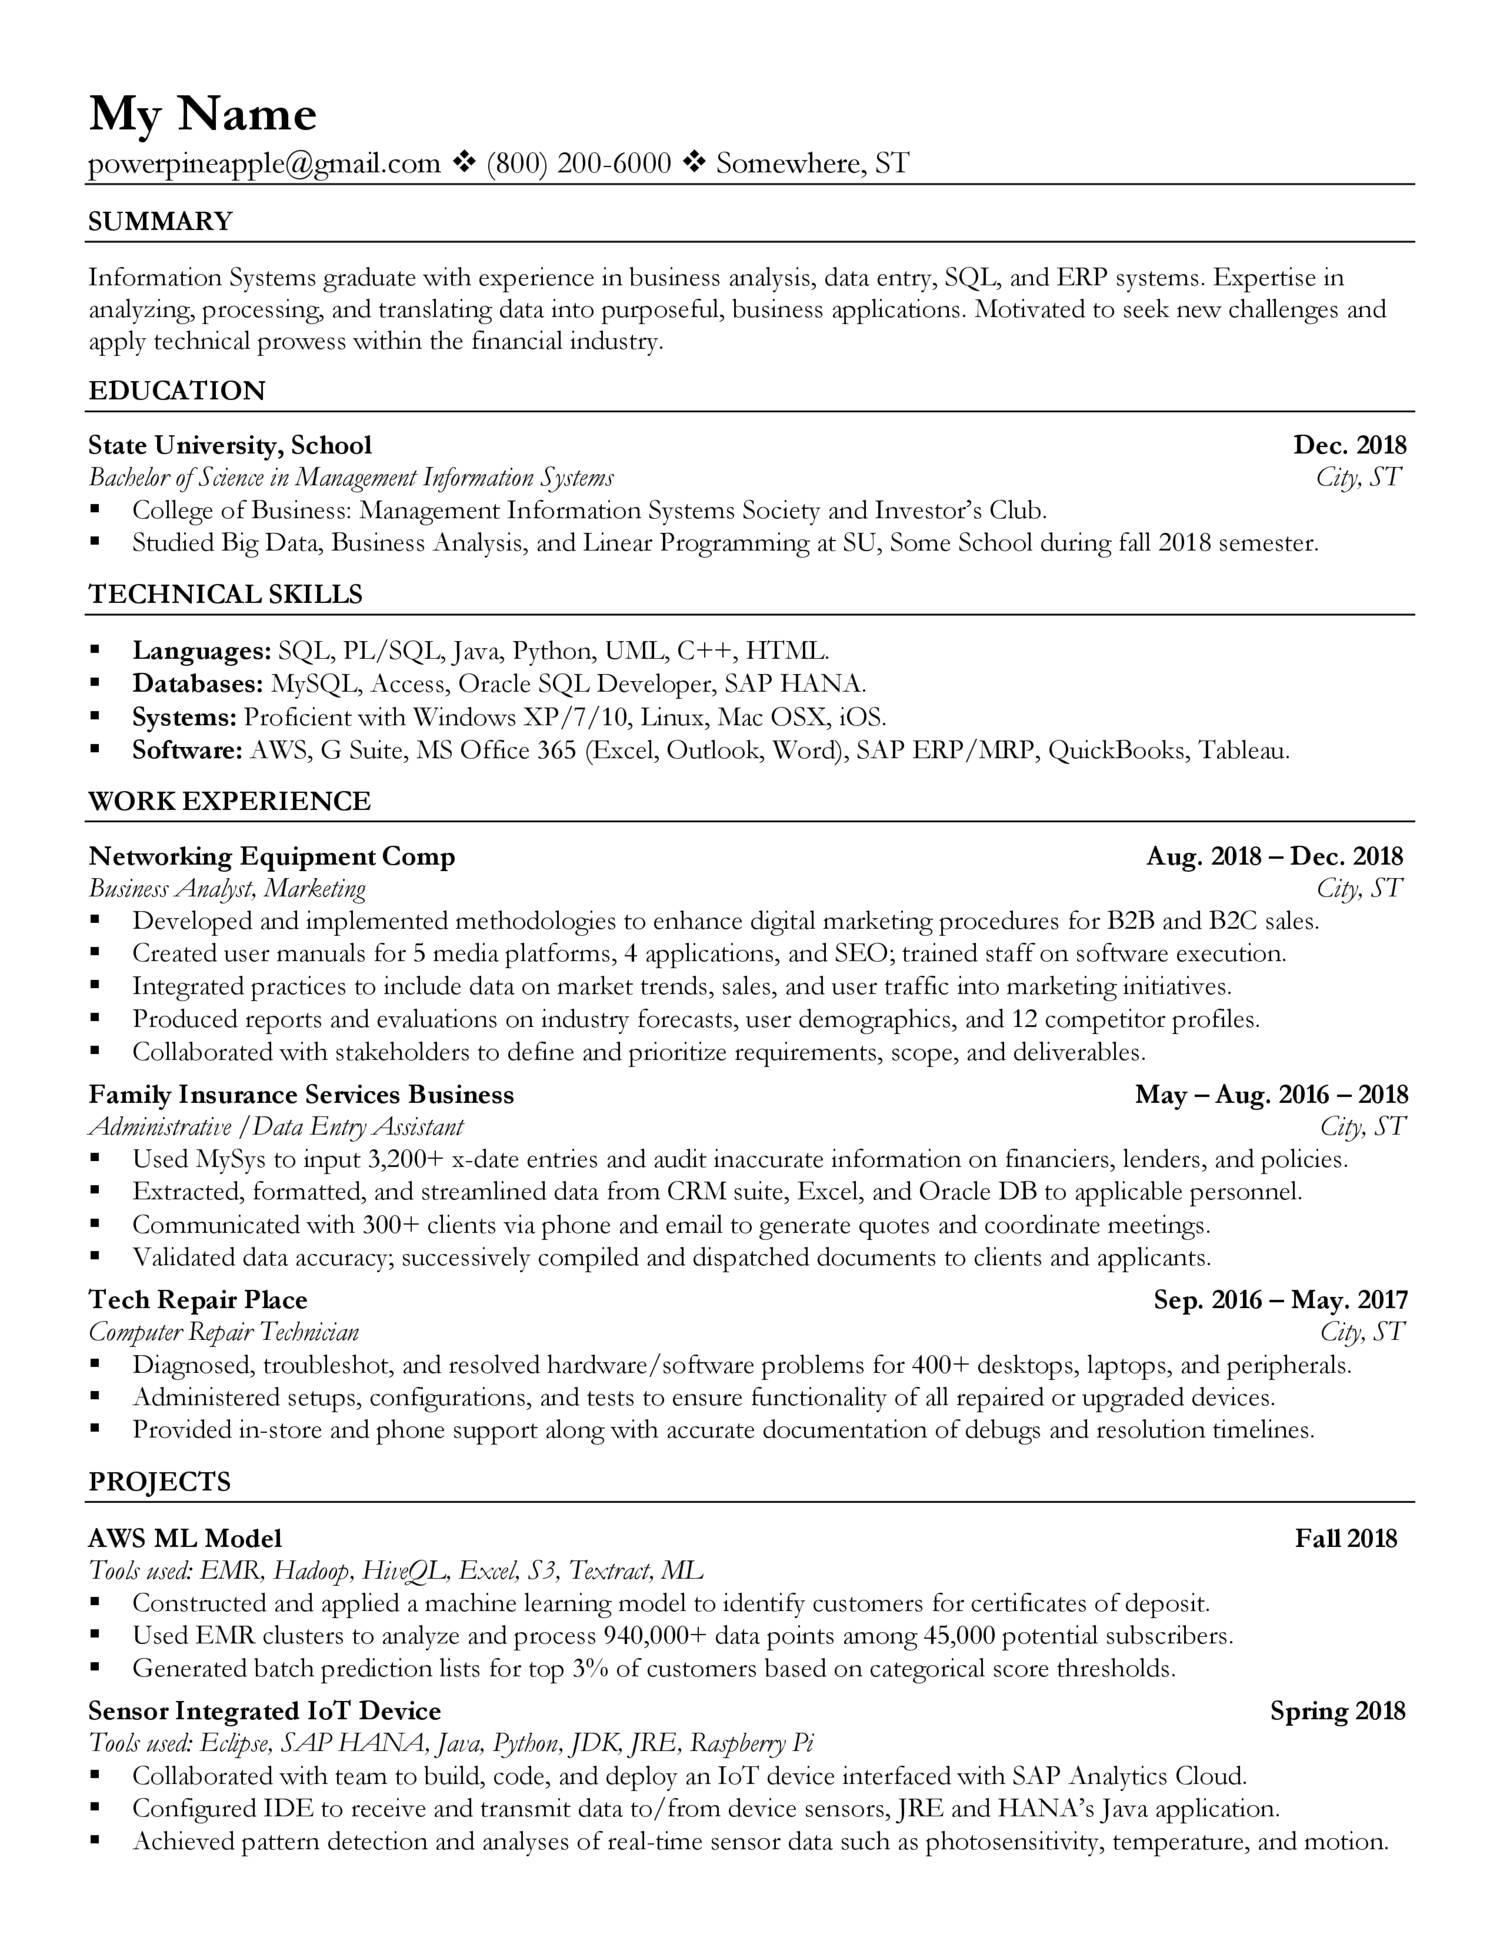 Office 365 Reddit